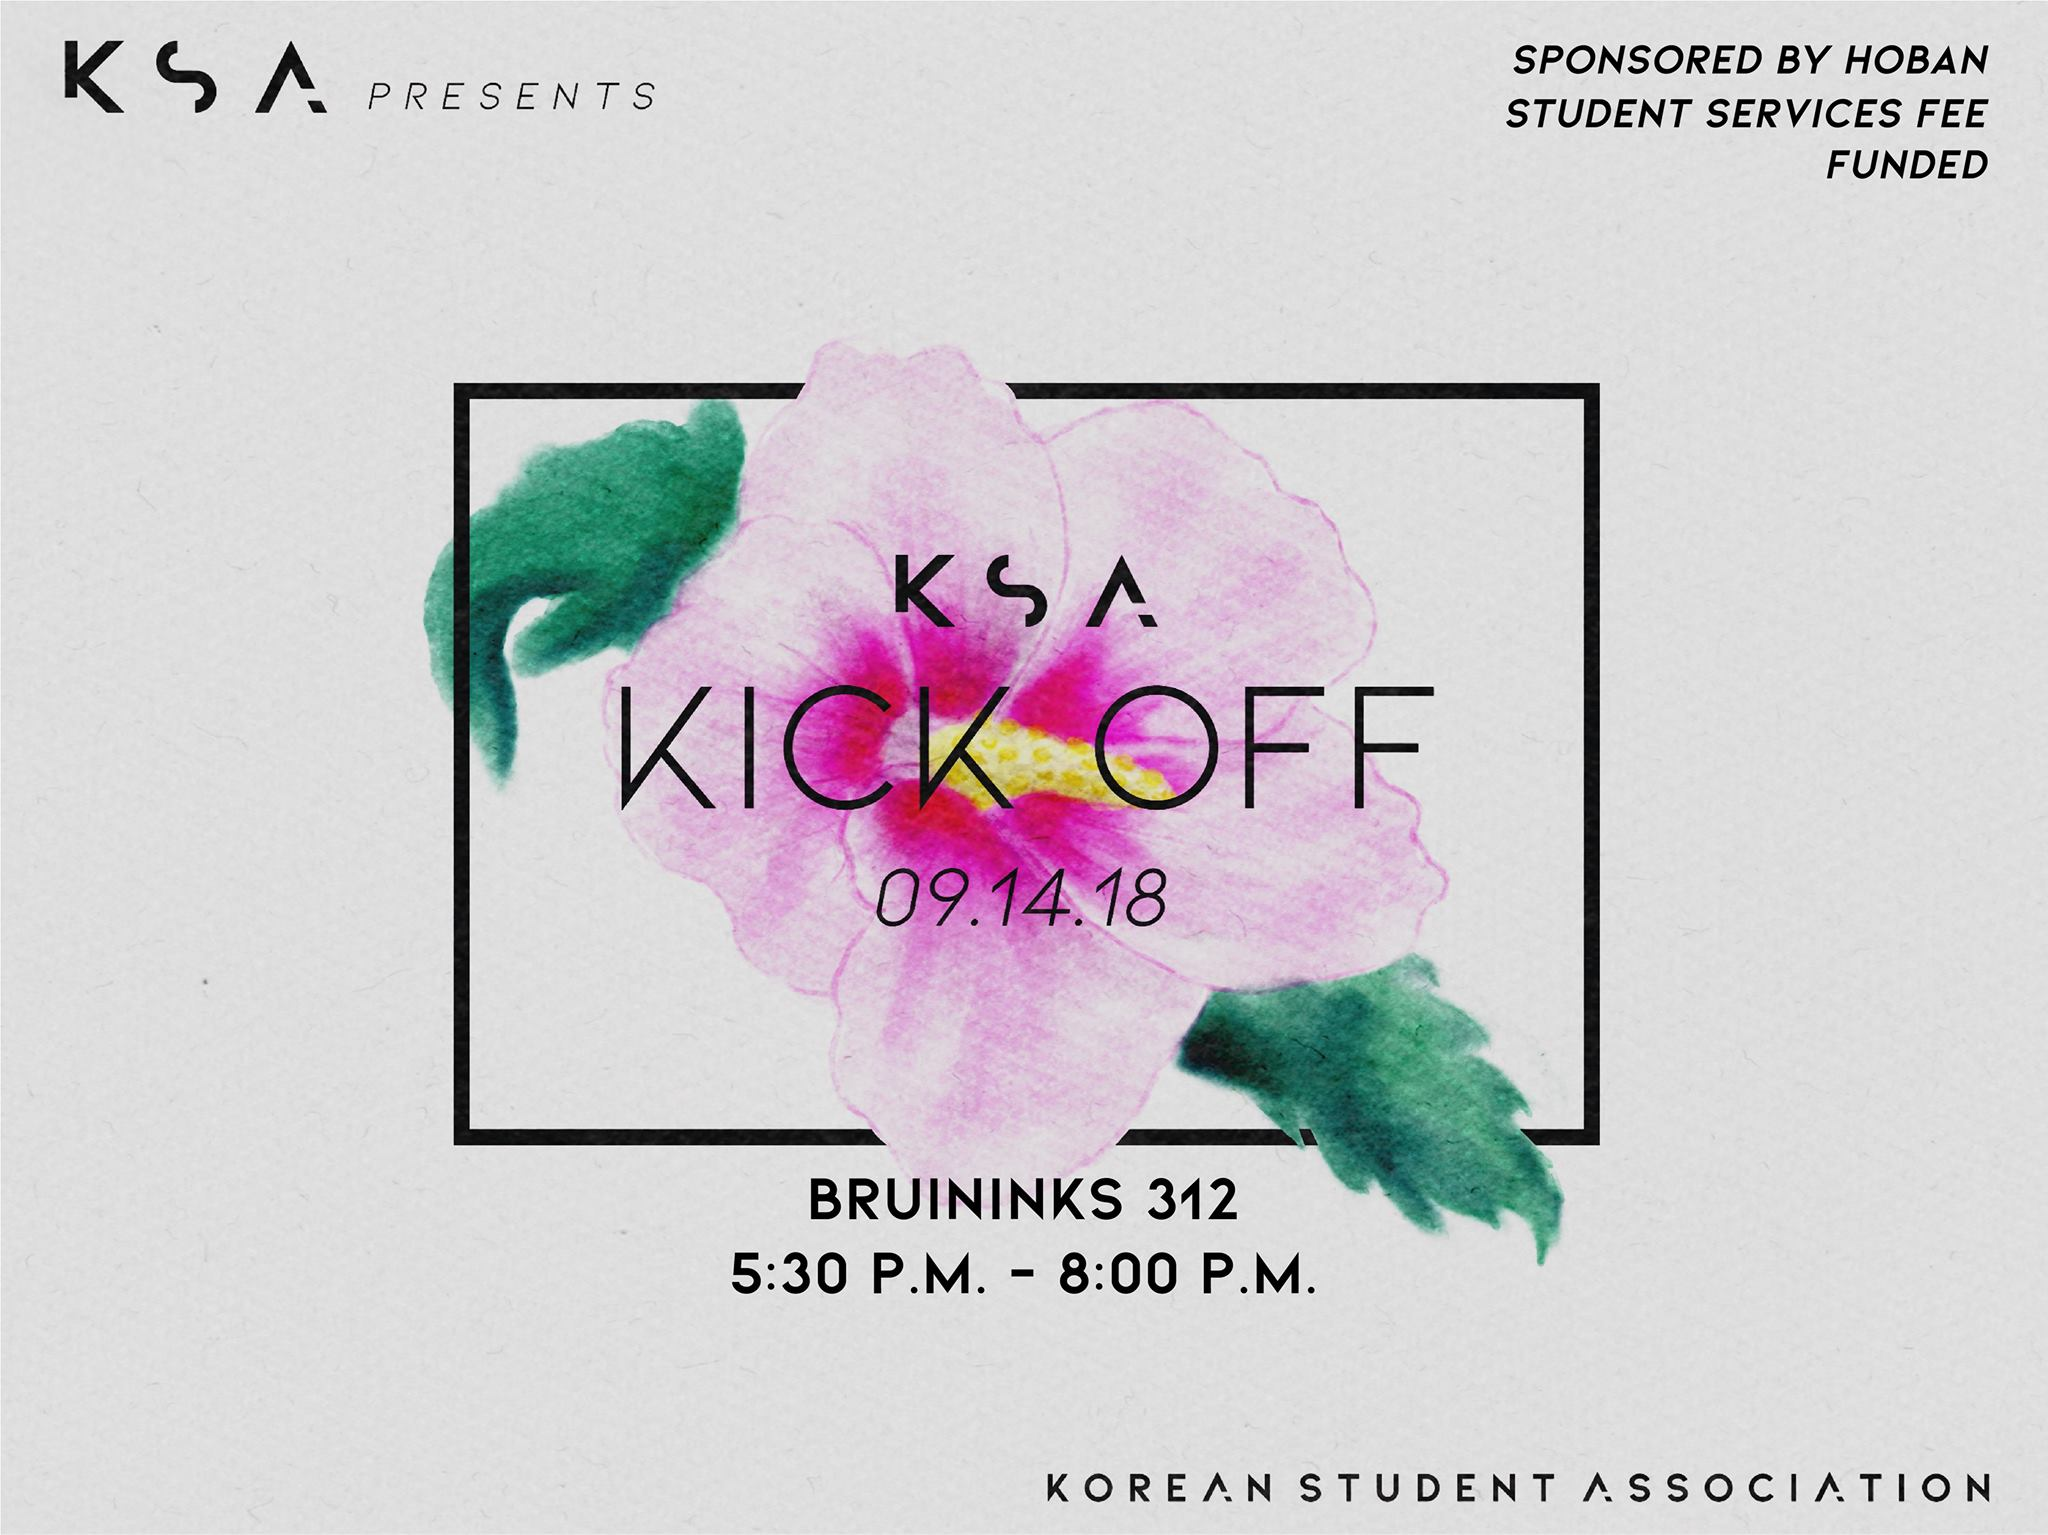 KSA Kick Off - Bruininks 312Sept. 14 5:30PM-8:00PM